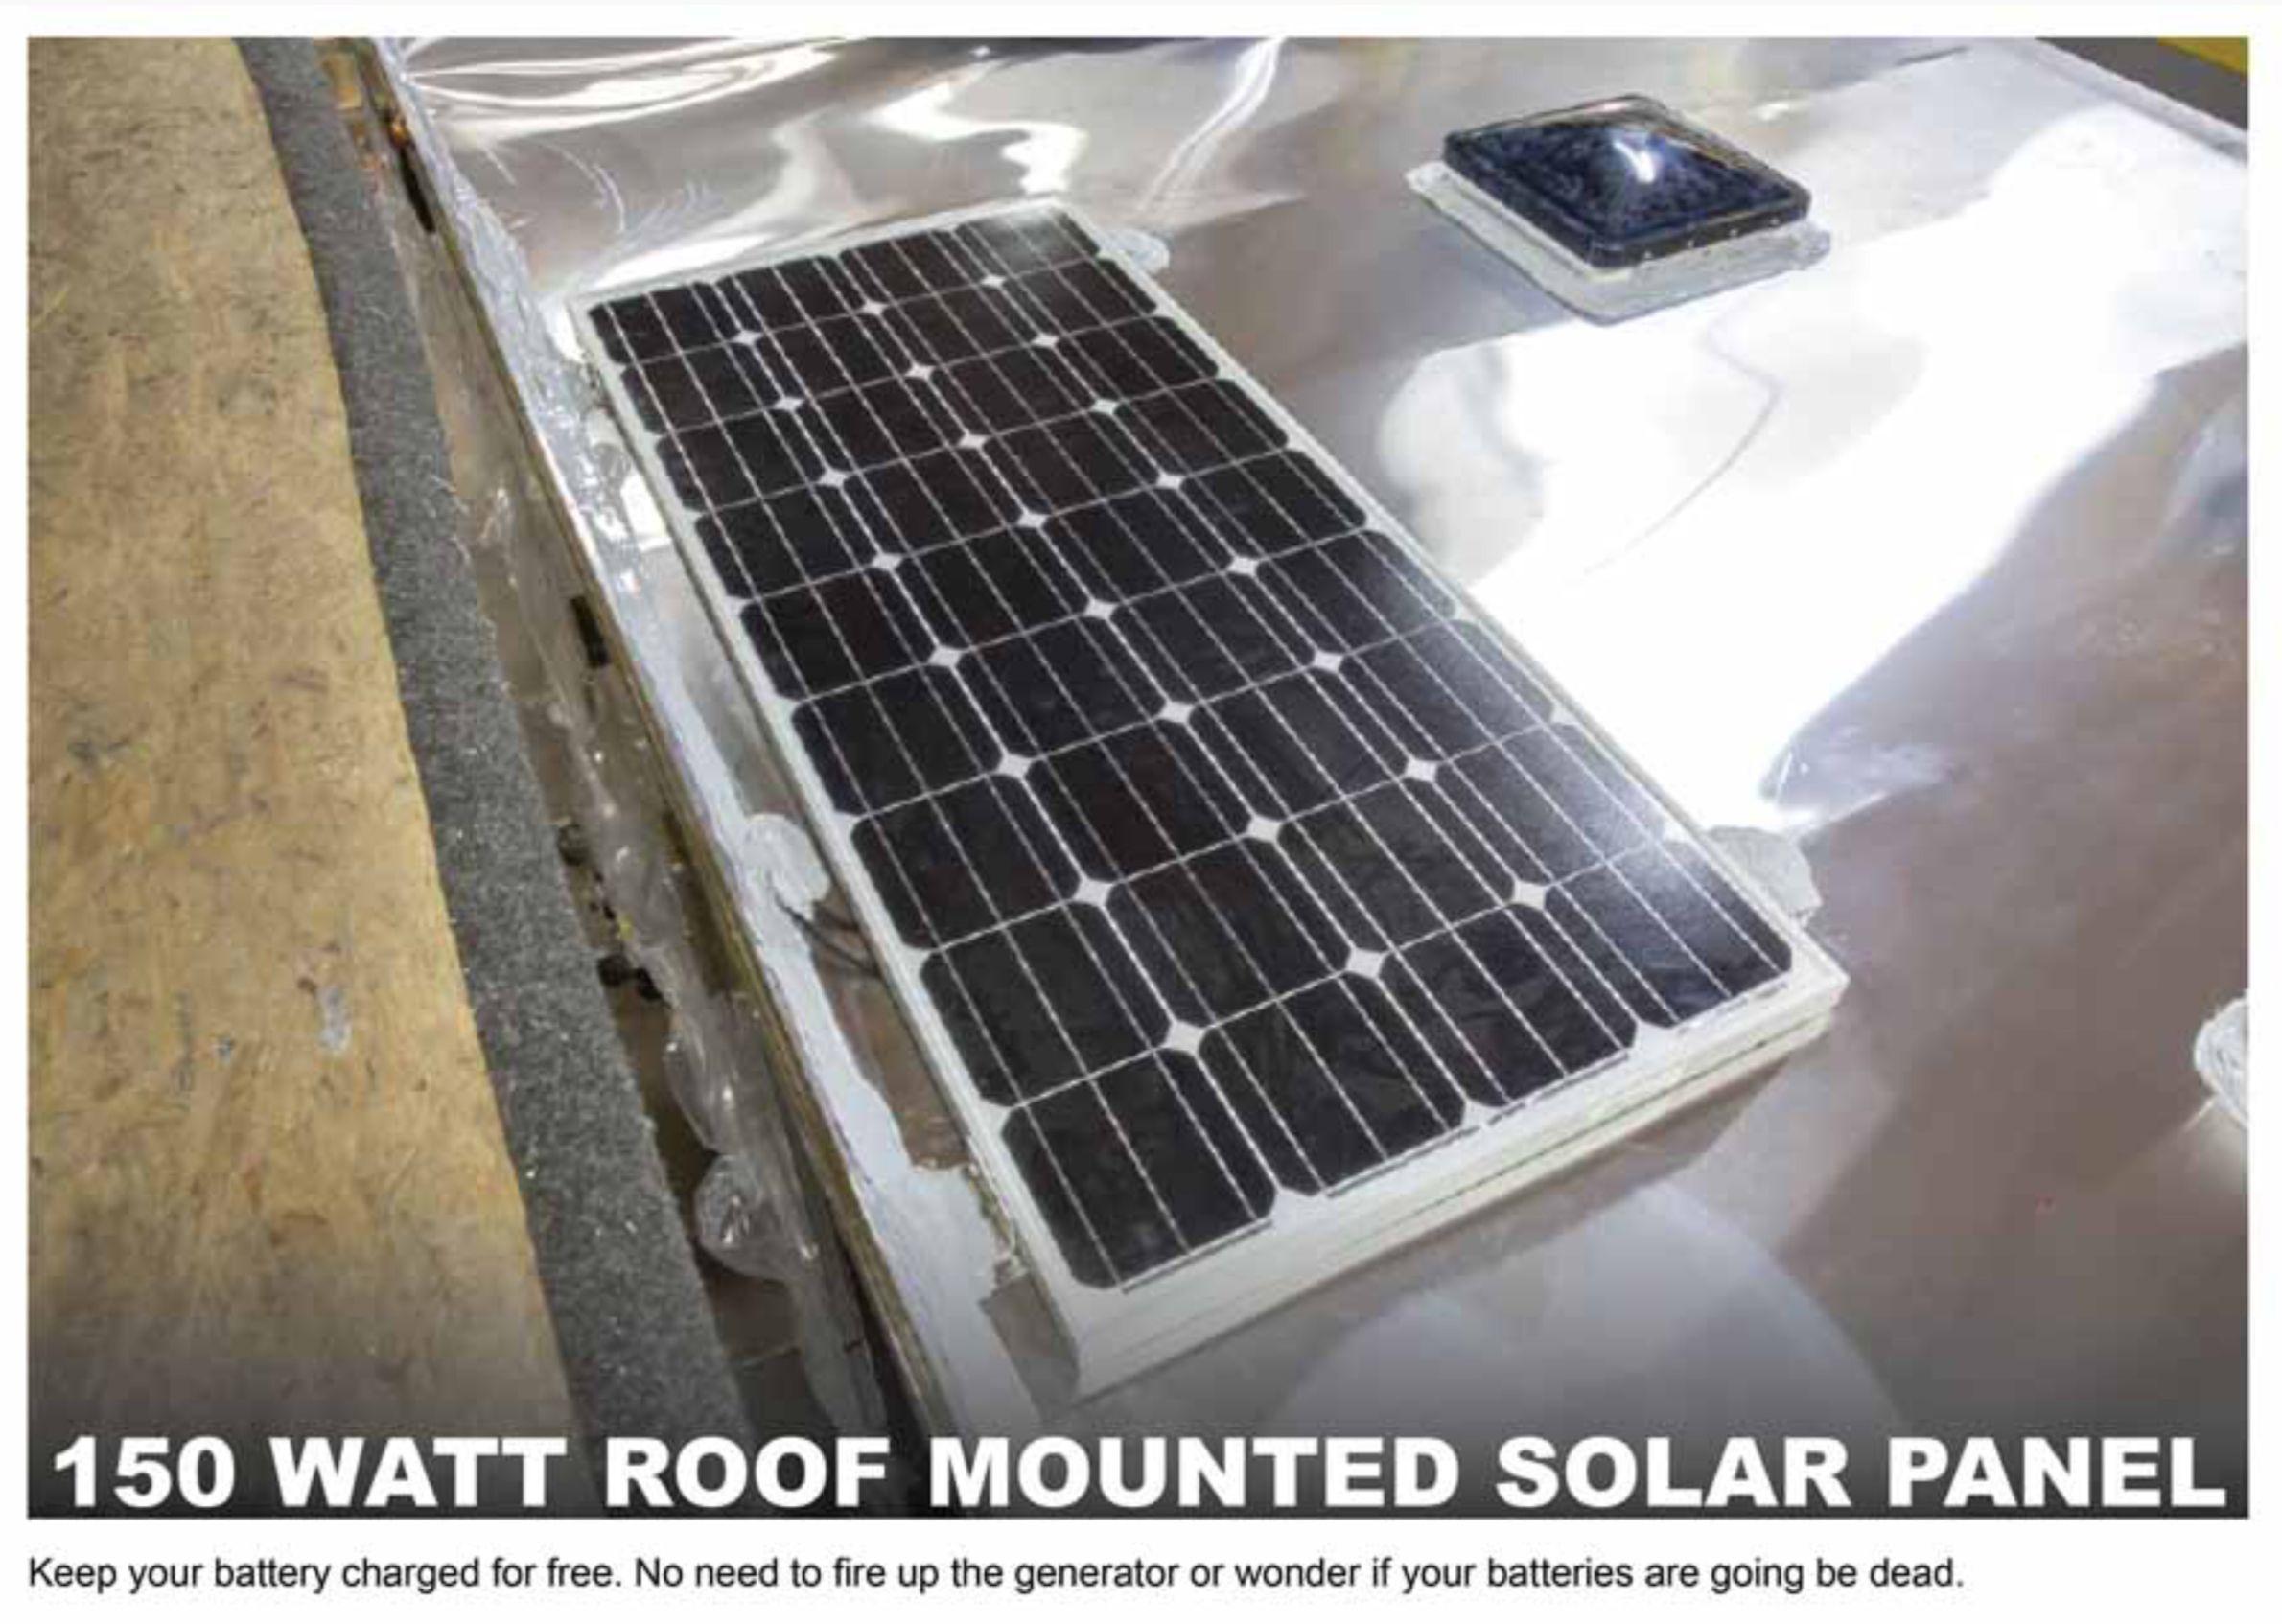 Option 150 Watt Roof Mounted Solar Panel Solar Panels Solar Panels For Home Diy Solar Panel